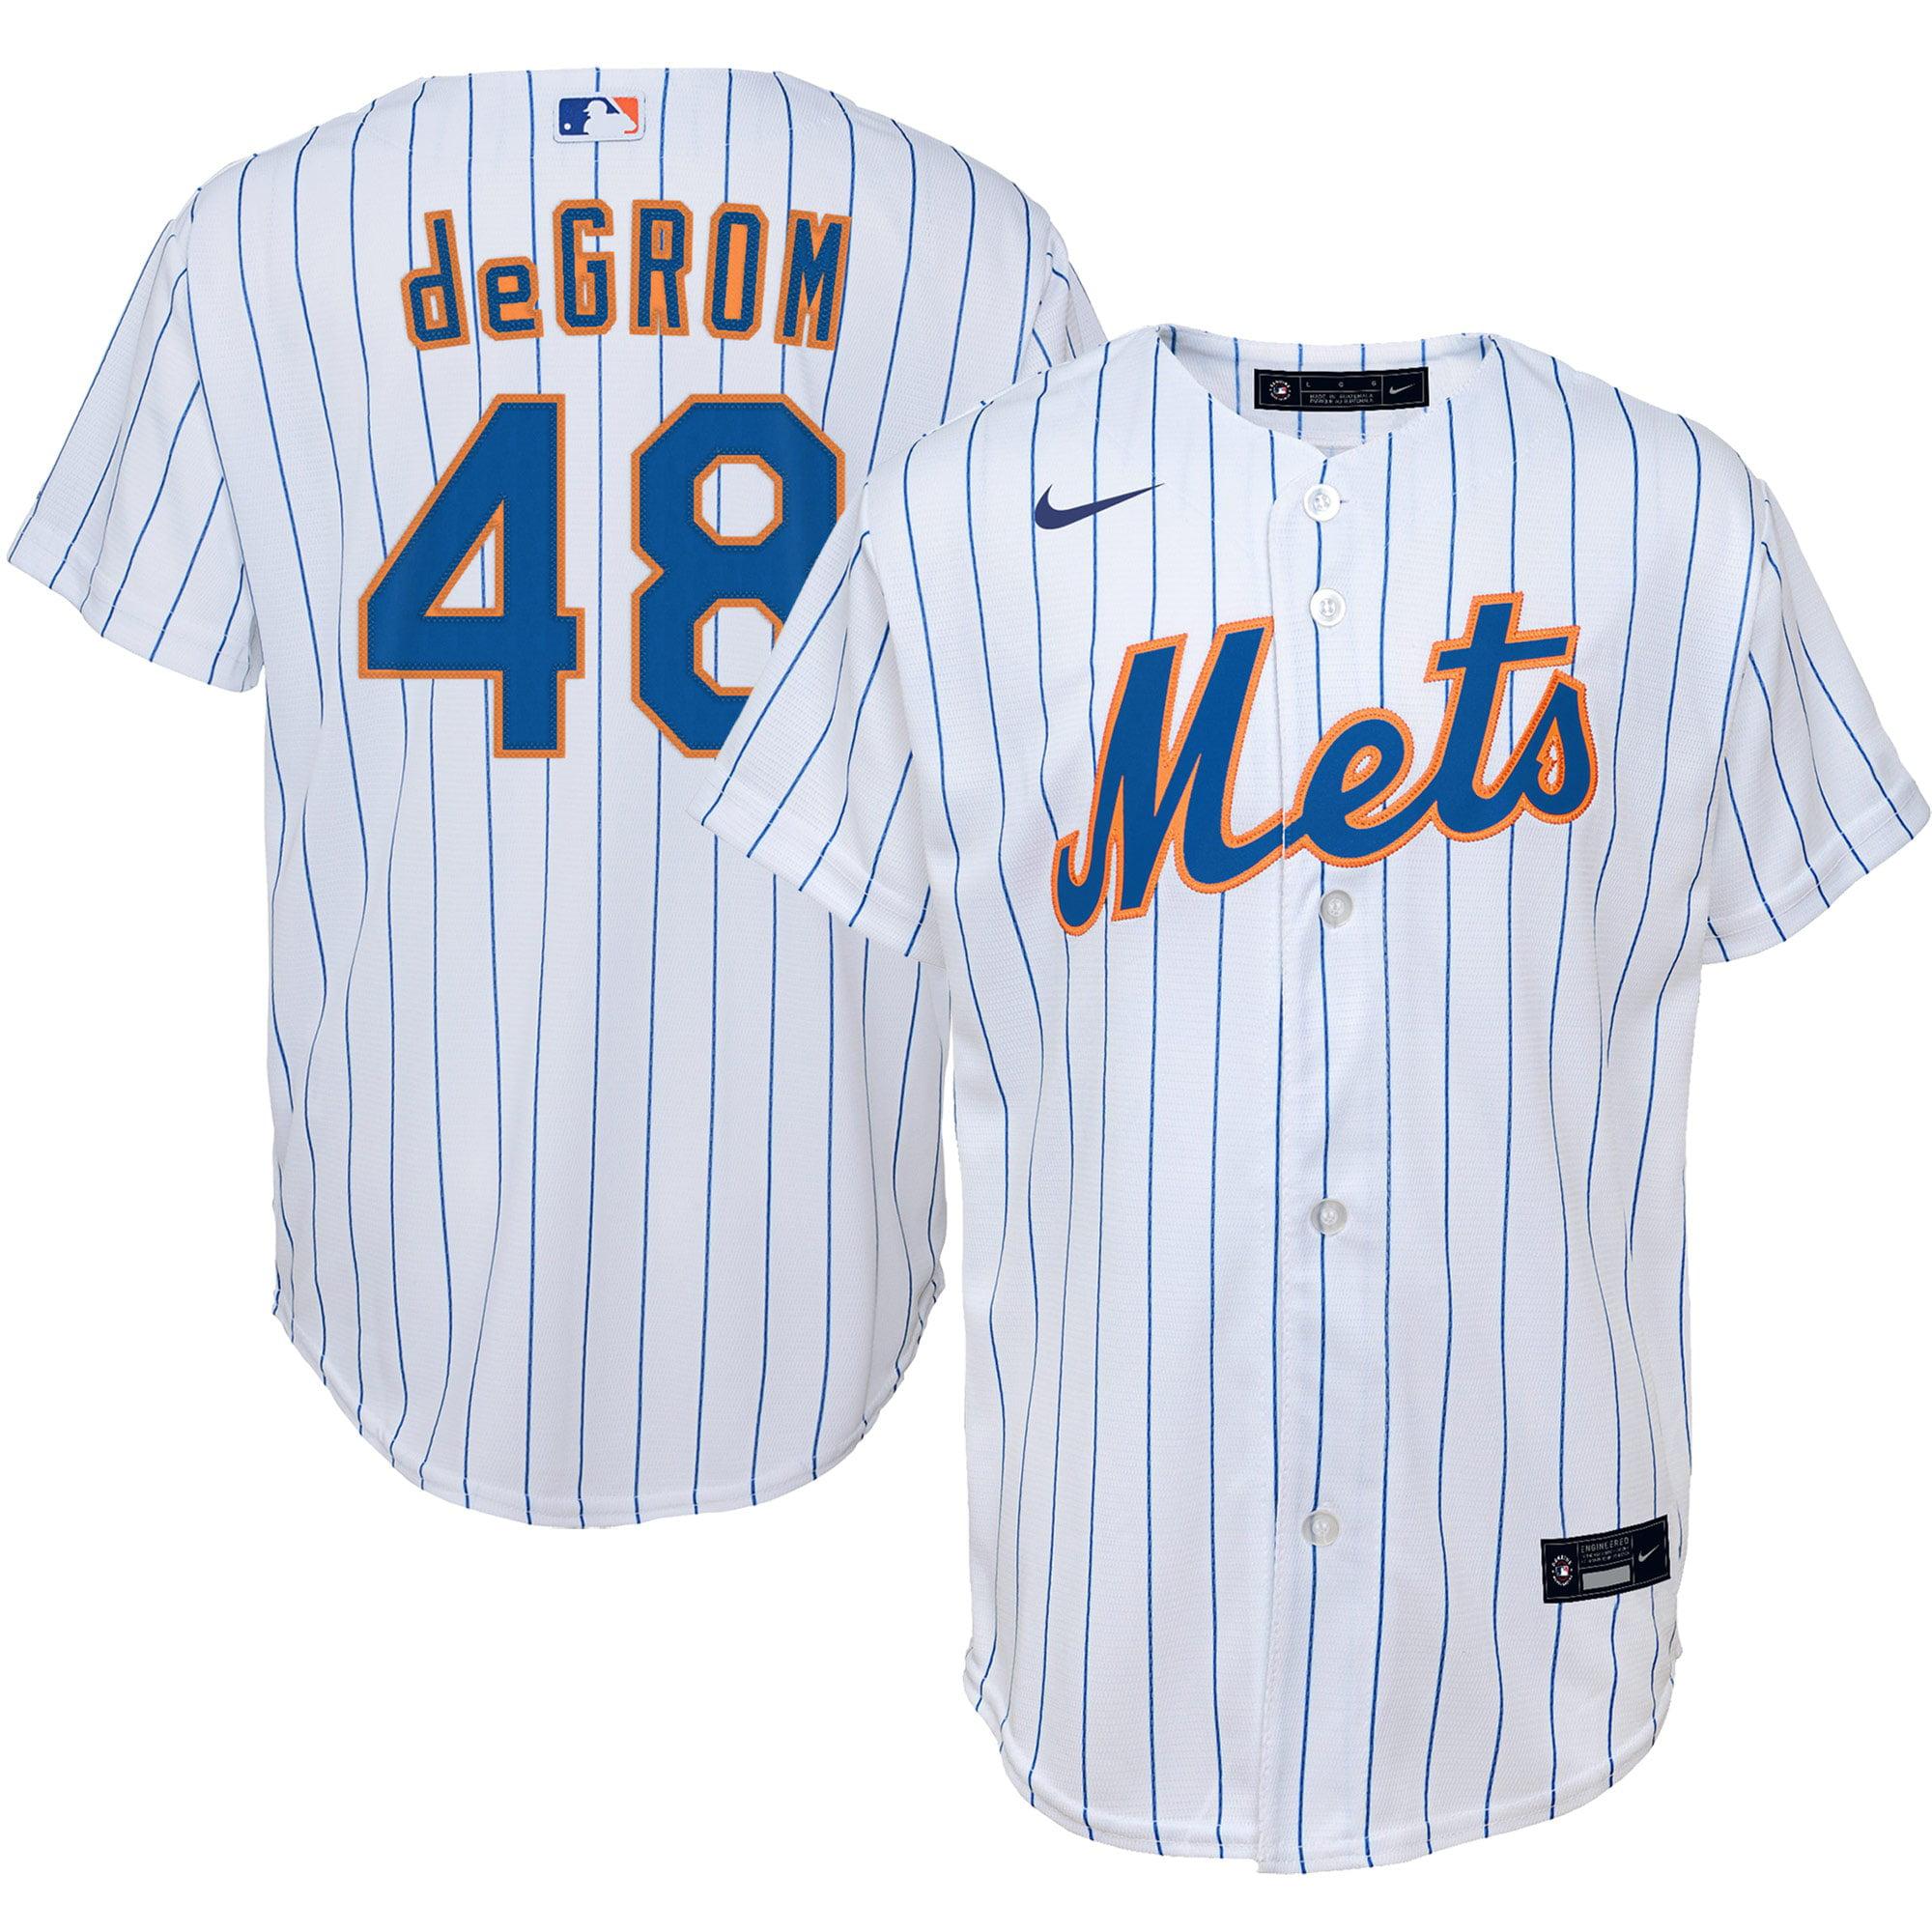 Jacob deGrom New York Mets Nike Youth Home Replica Player Jersey - White - Walmart.com